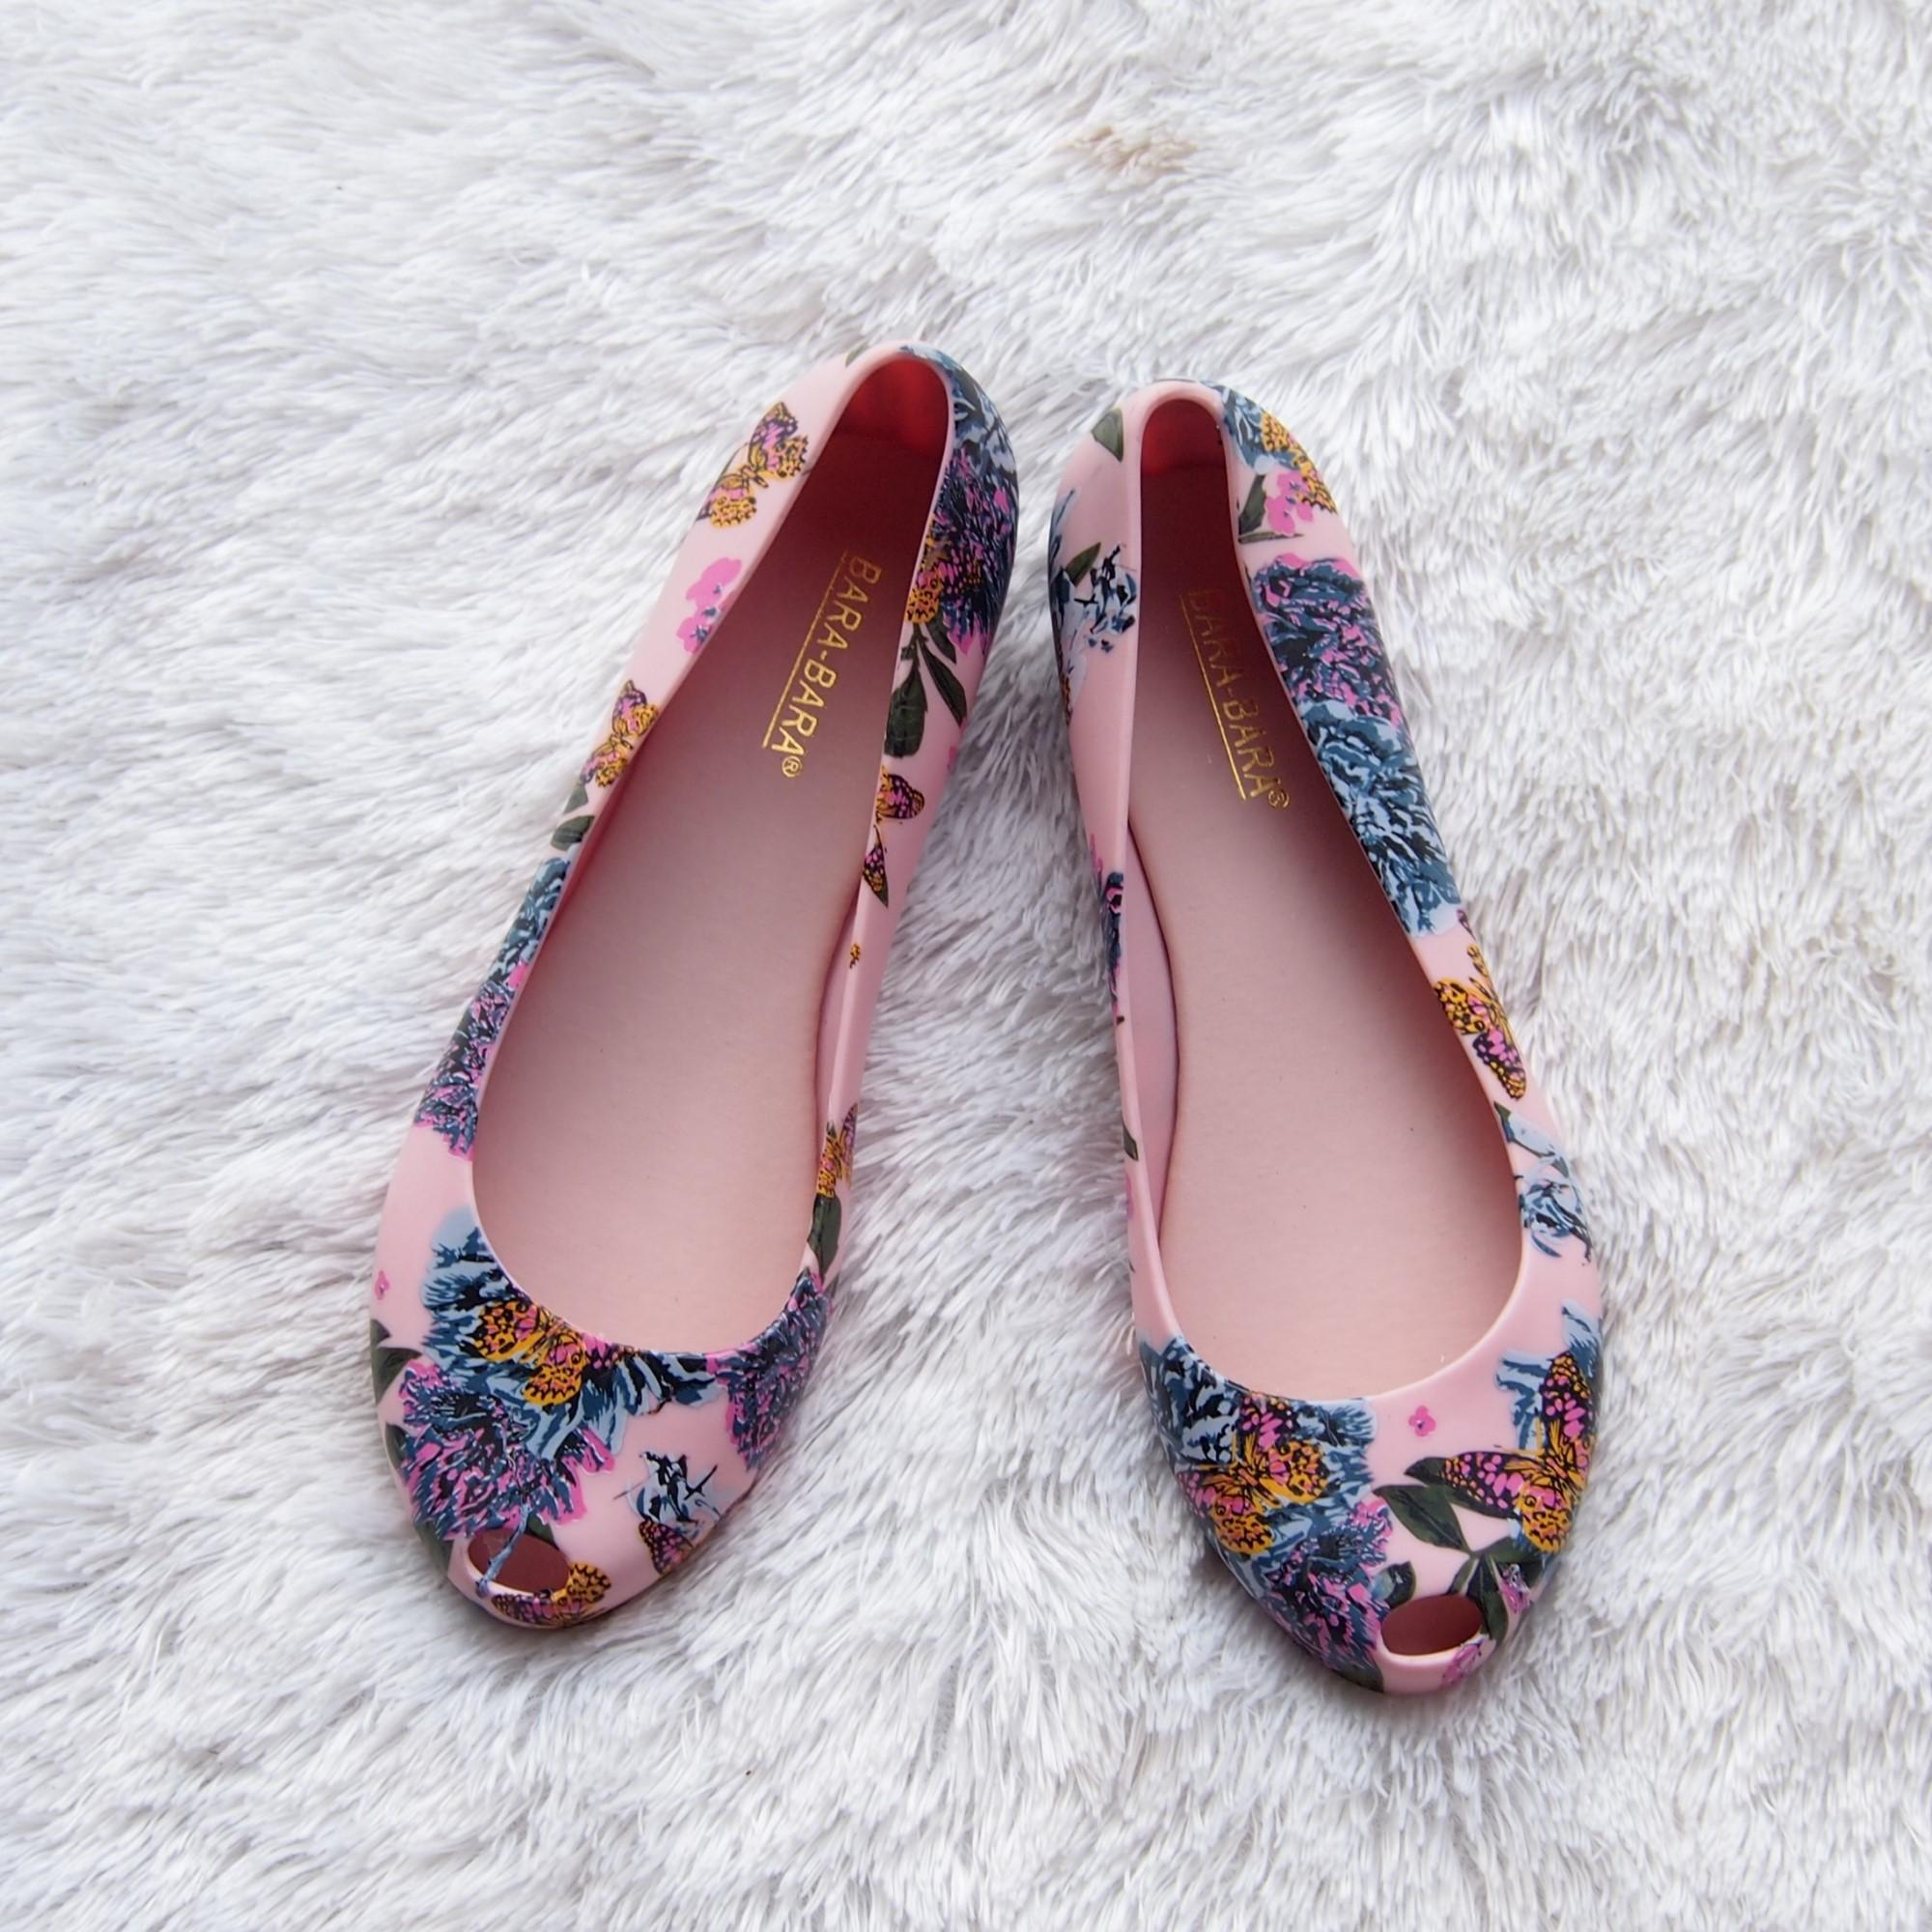 Flat Shoes Bara Bara - Flat Shoes Jelly Wanita Motif Bunga 1838MSB